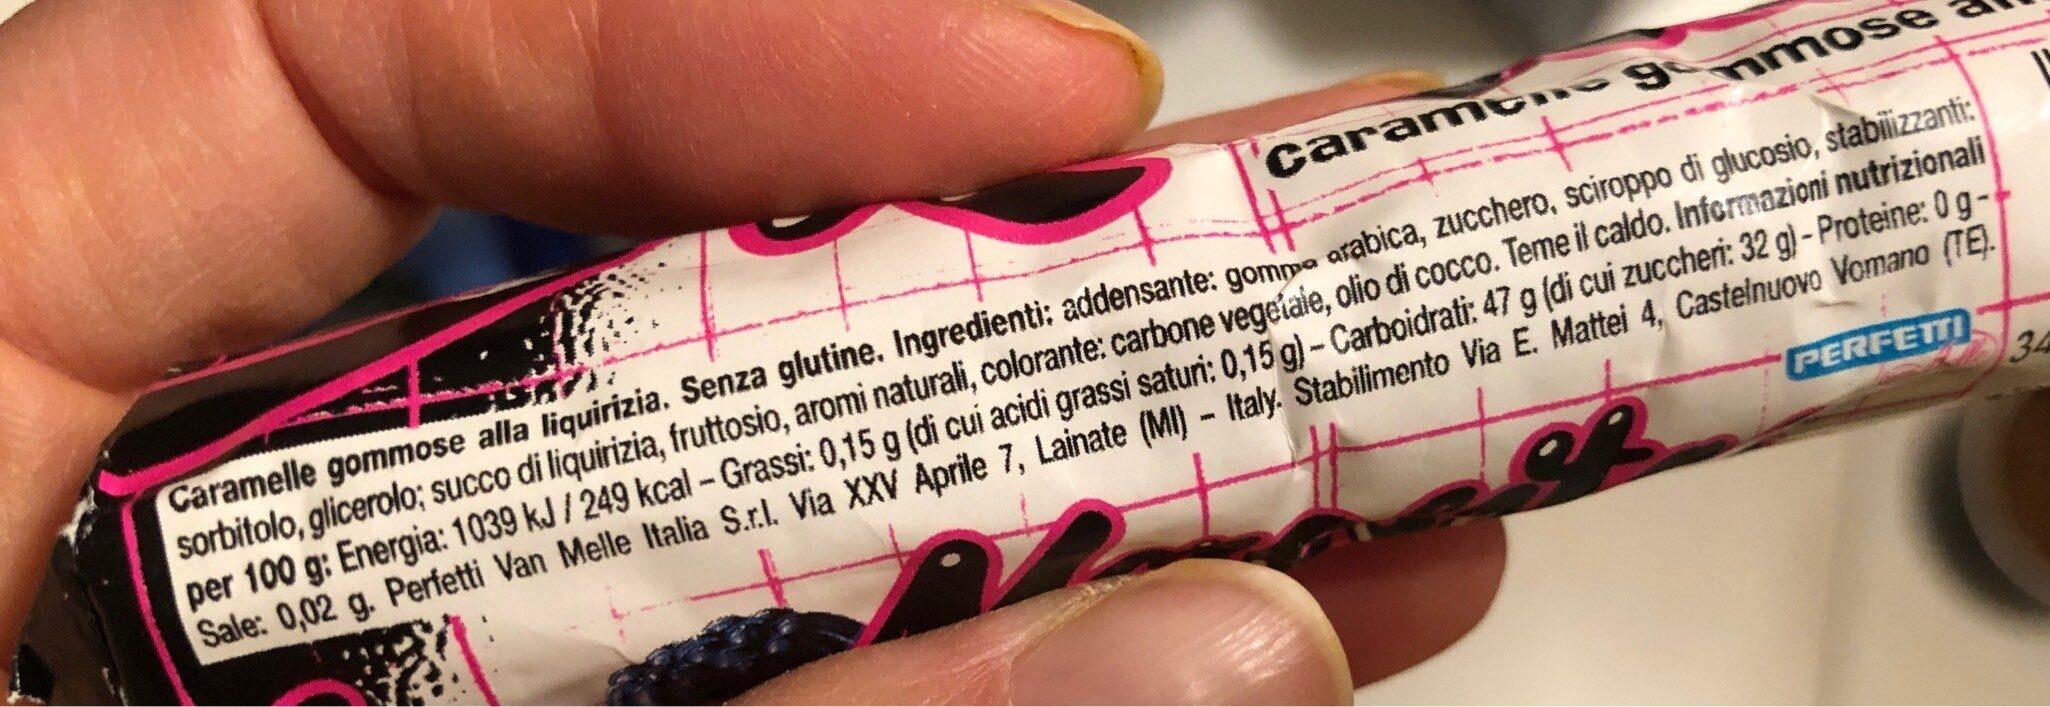 Morositas - Informations nutritionnelles - fr